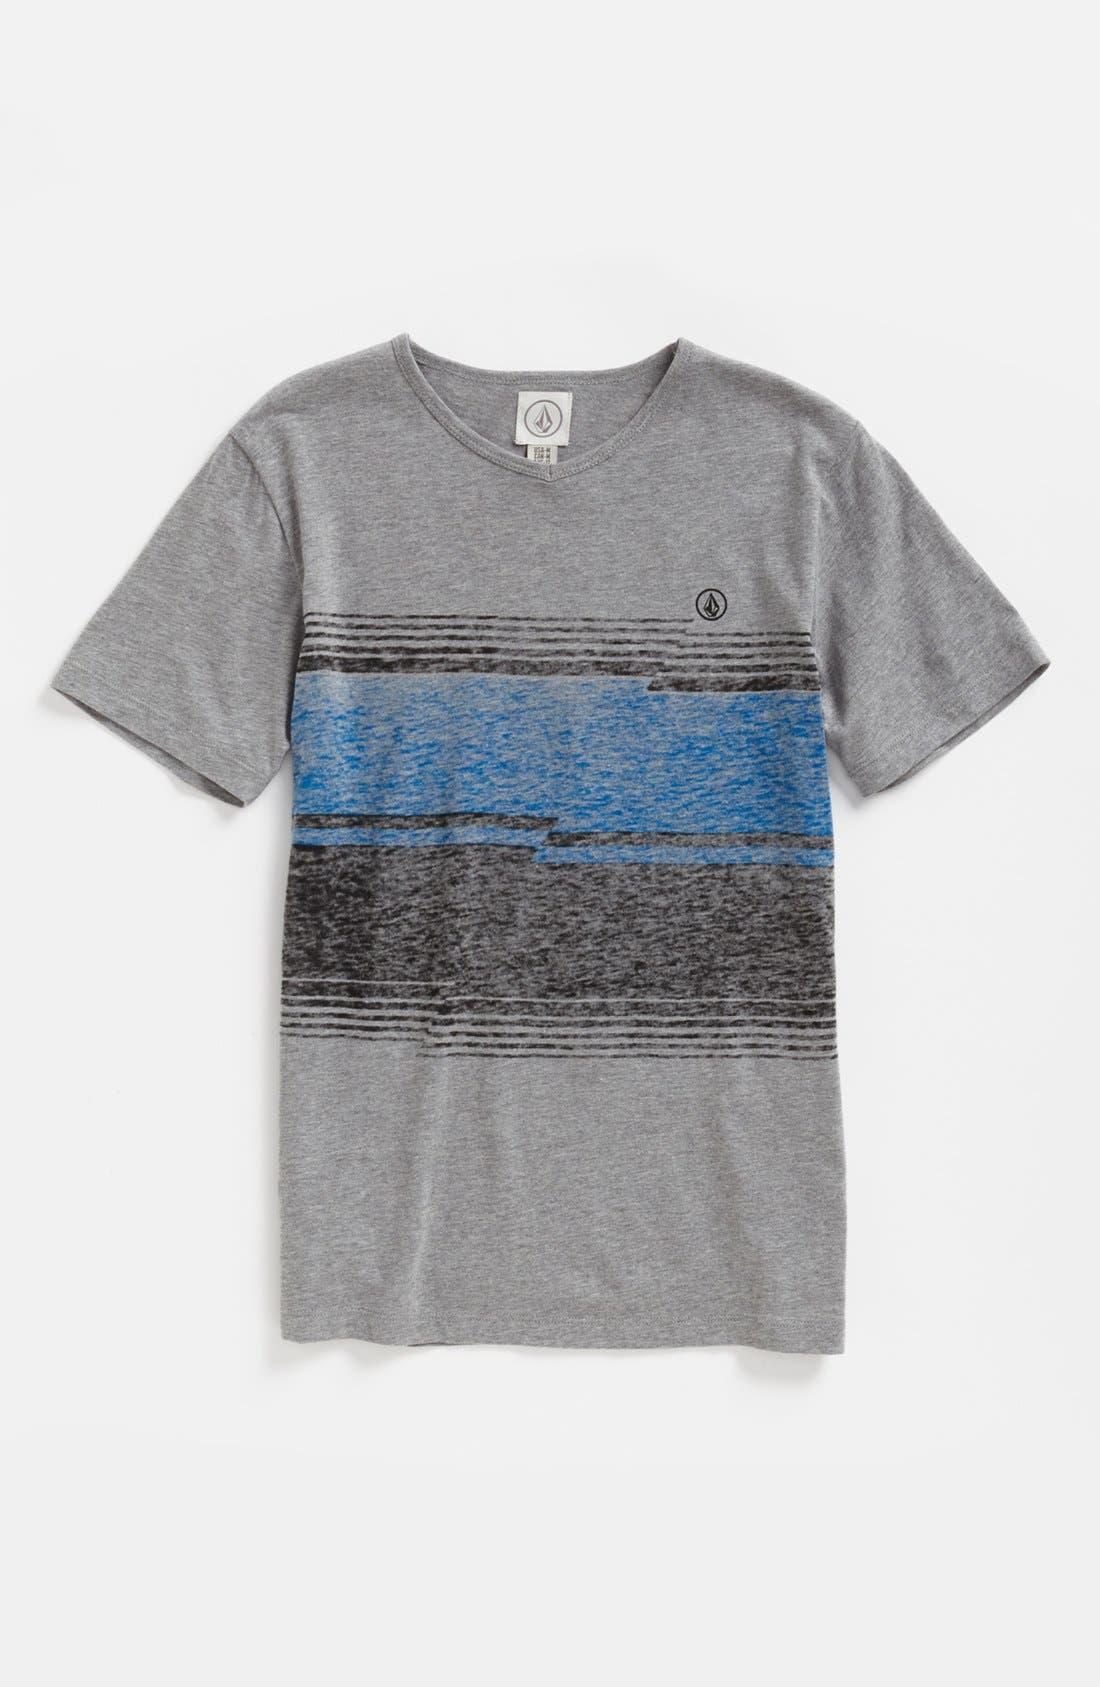 Alternate Image 1 Selected - Volcom 'Inferno' T-Shirt (Big Boys)